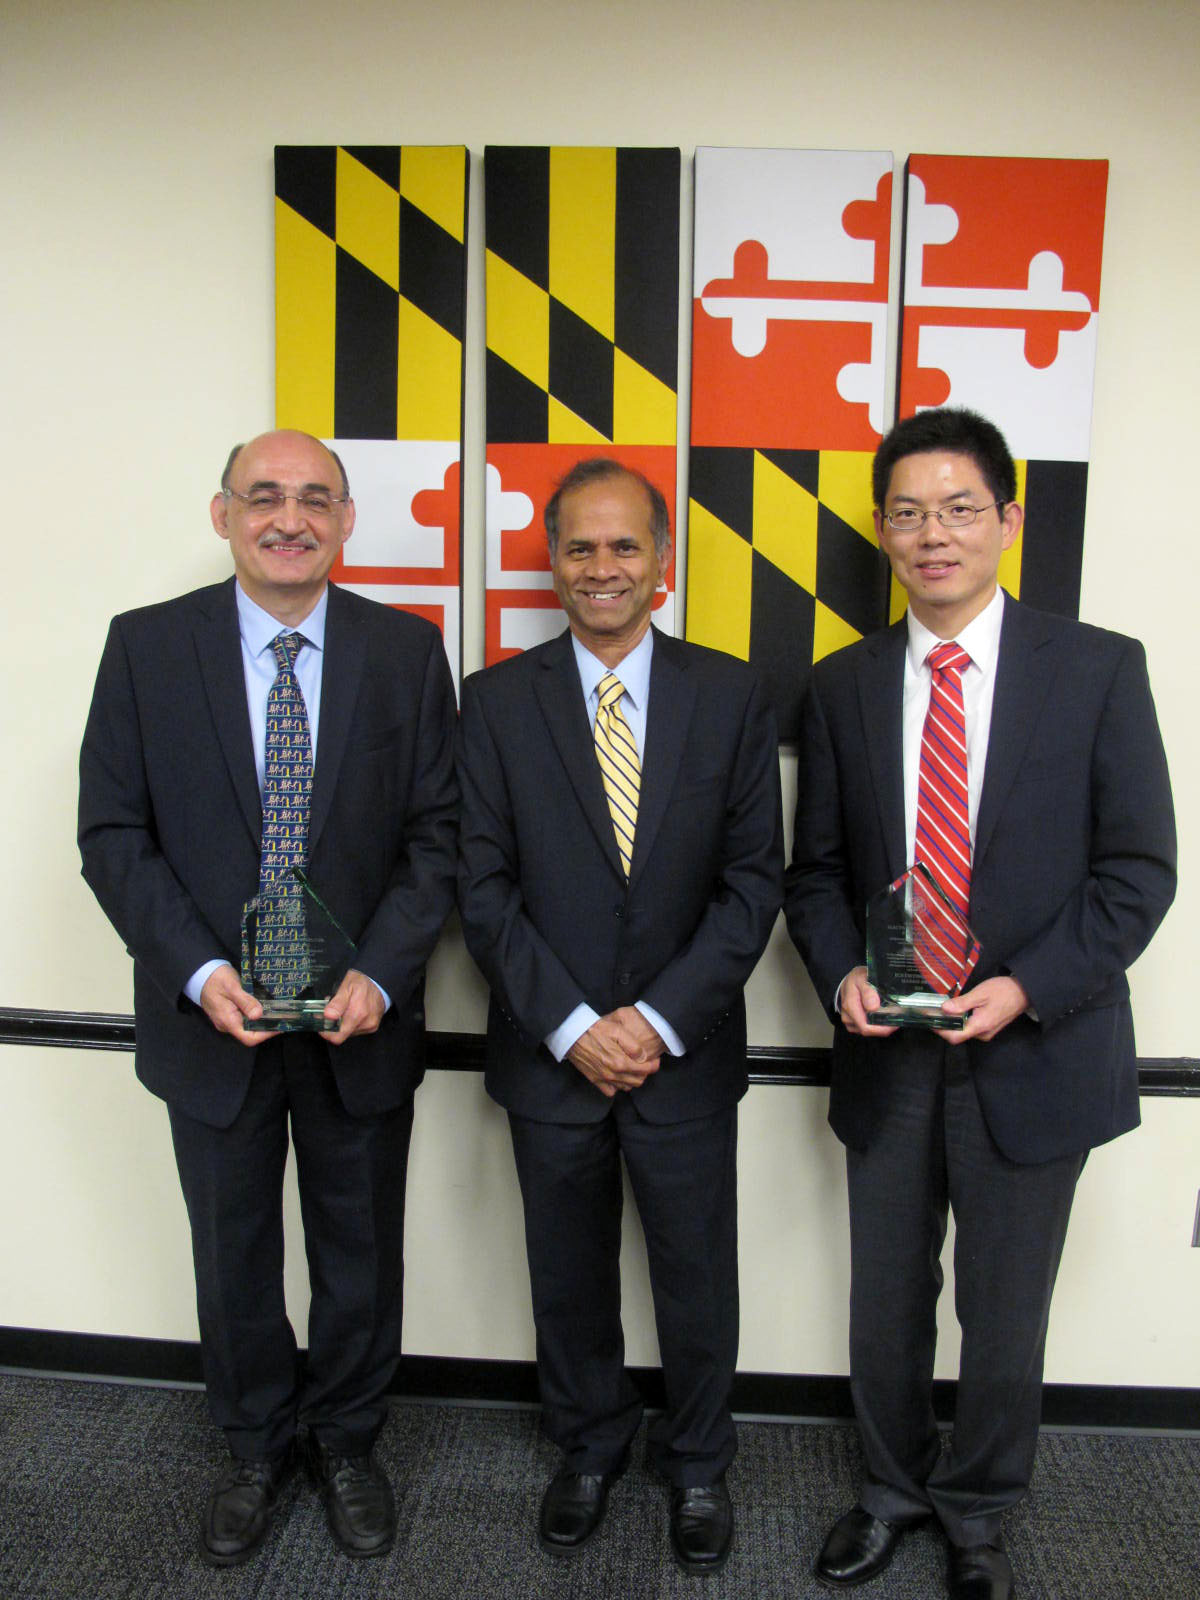 L-R: Dr. Reza Ghanadan, Dr. Rama Chellappa, and Dr. Xiaobo Tan.